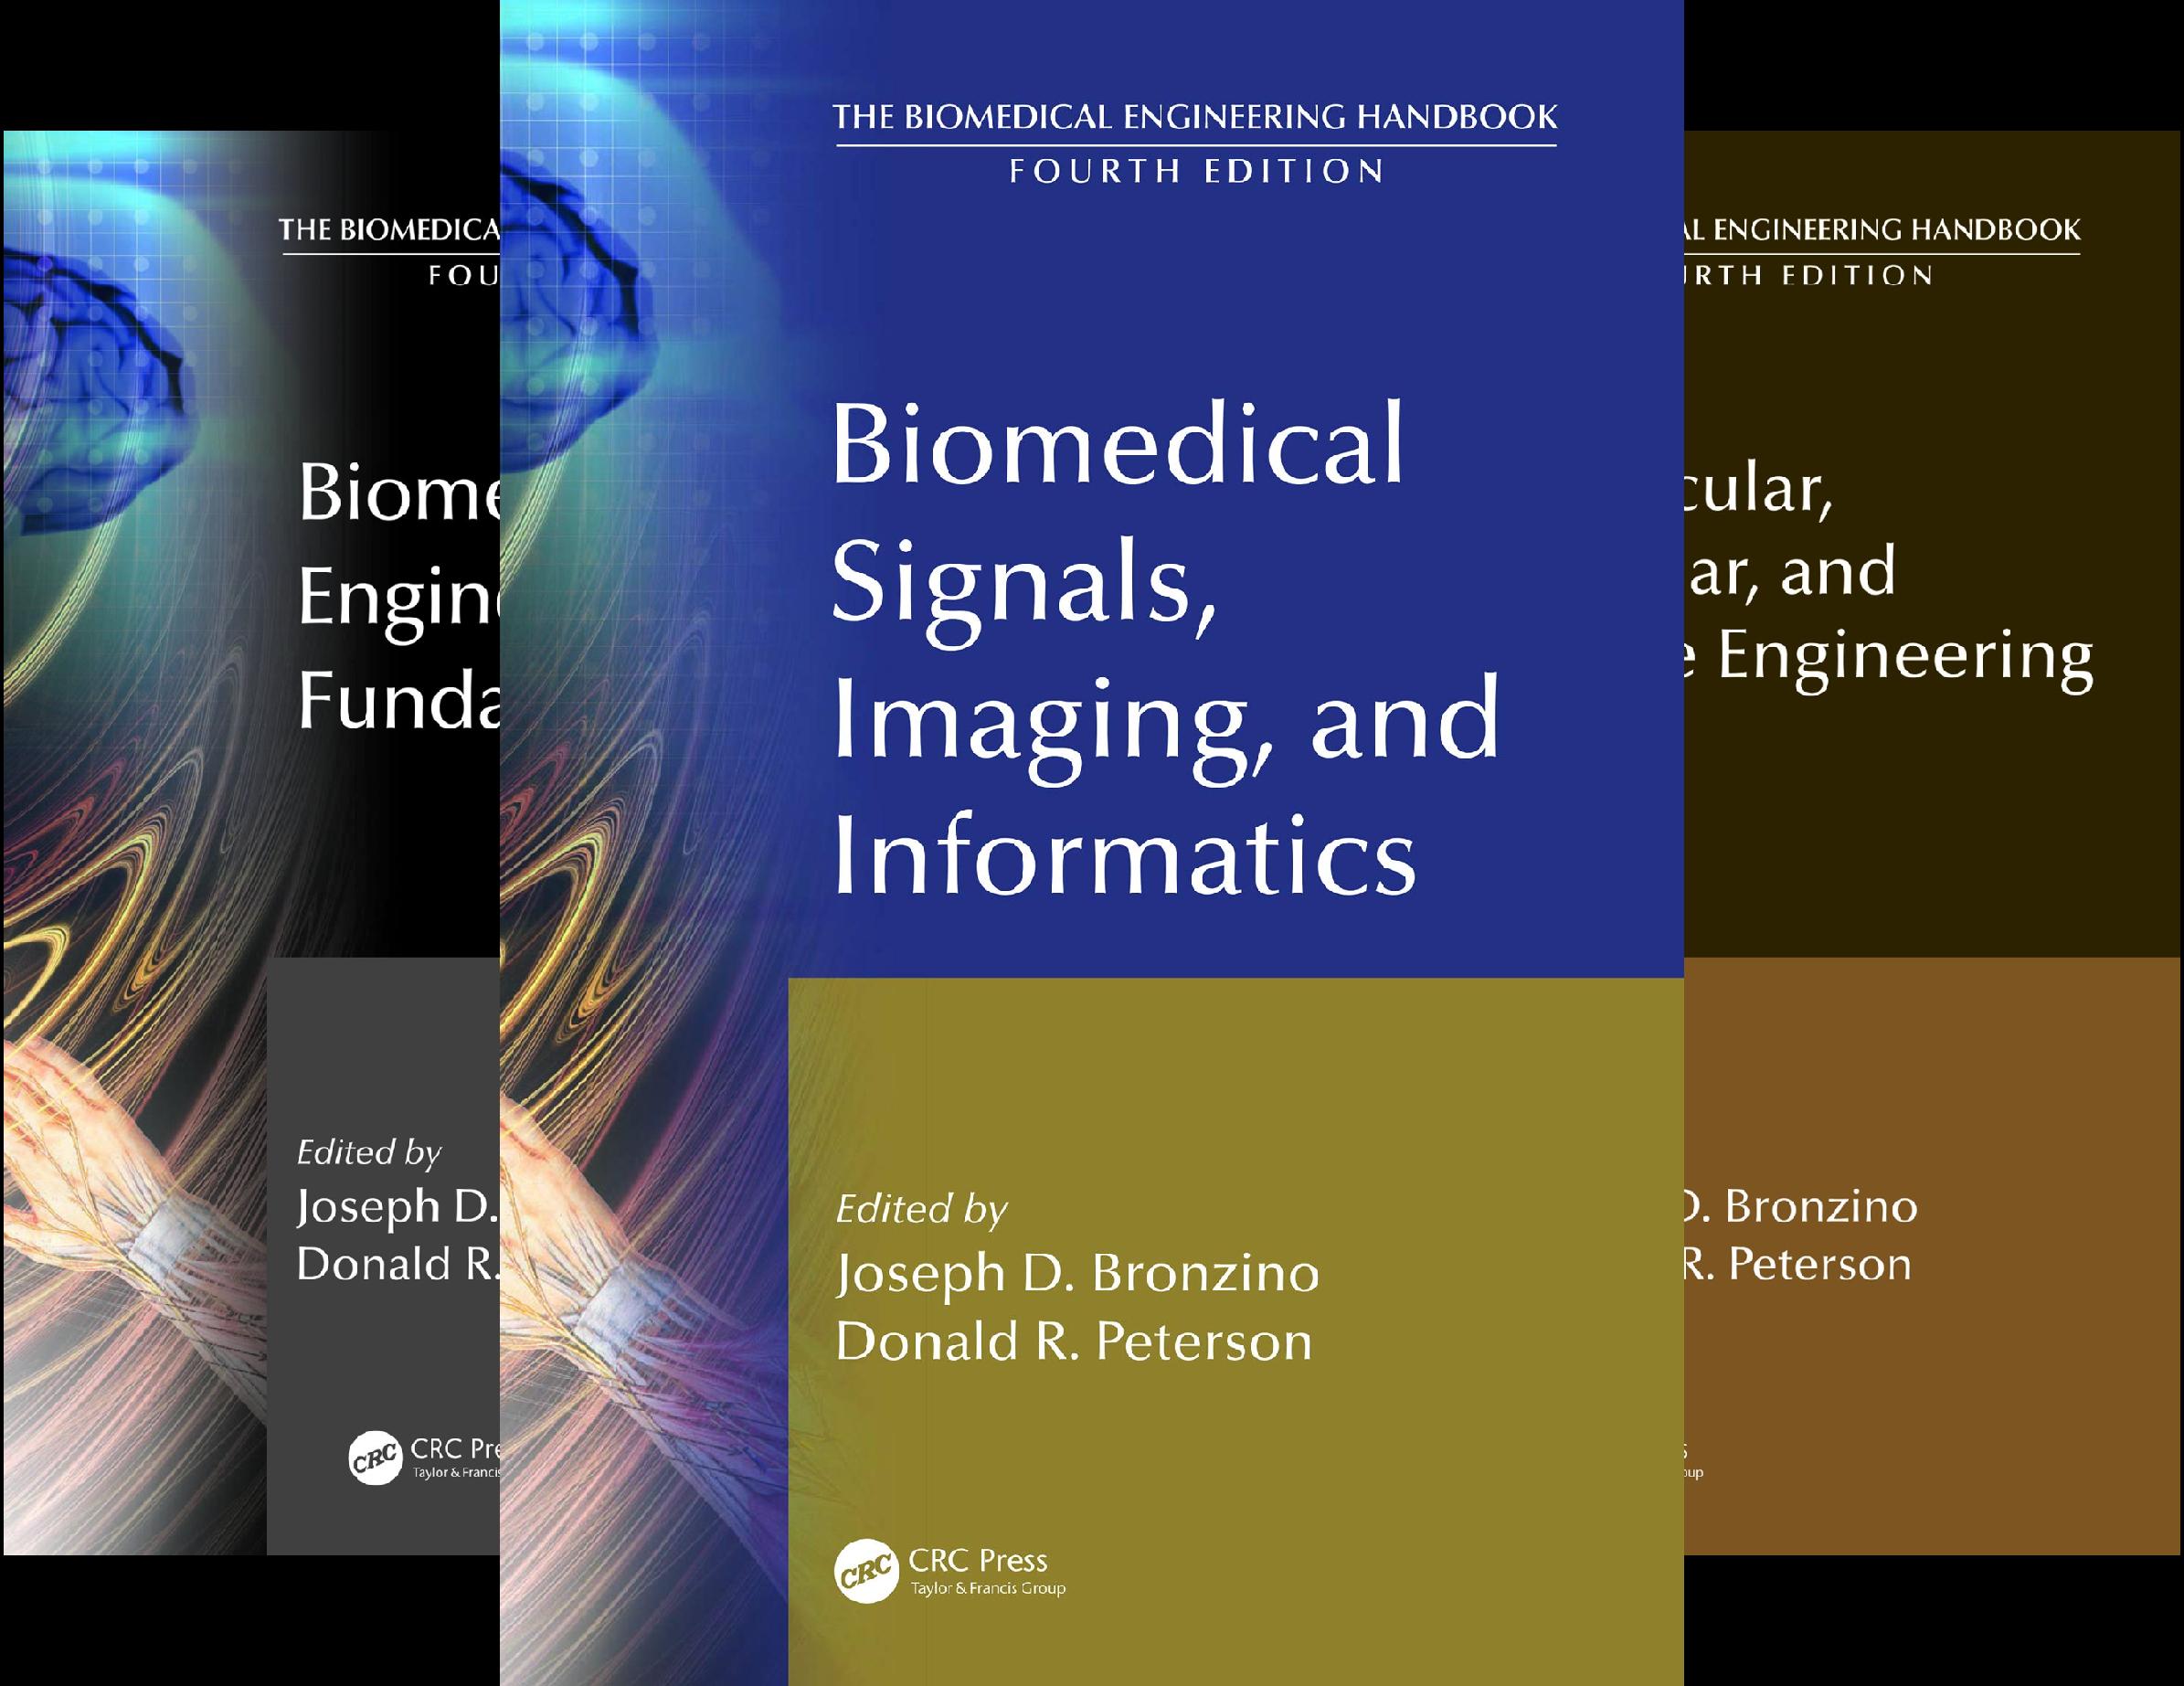 The Biomedical Engineering Handbook, Fourth Edition (5 Book Series)